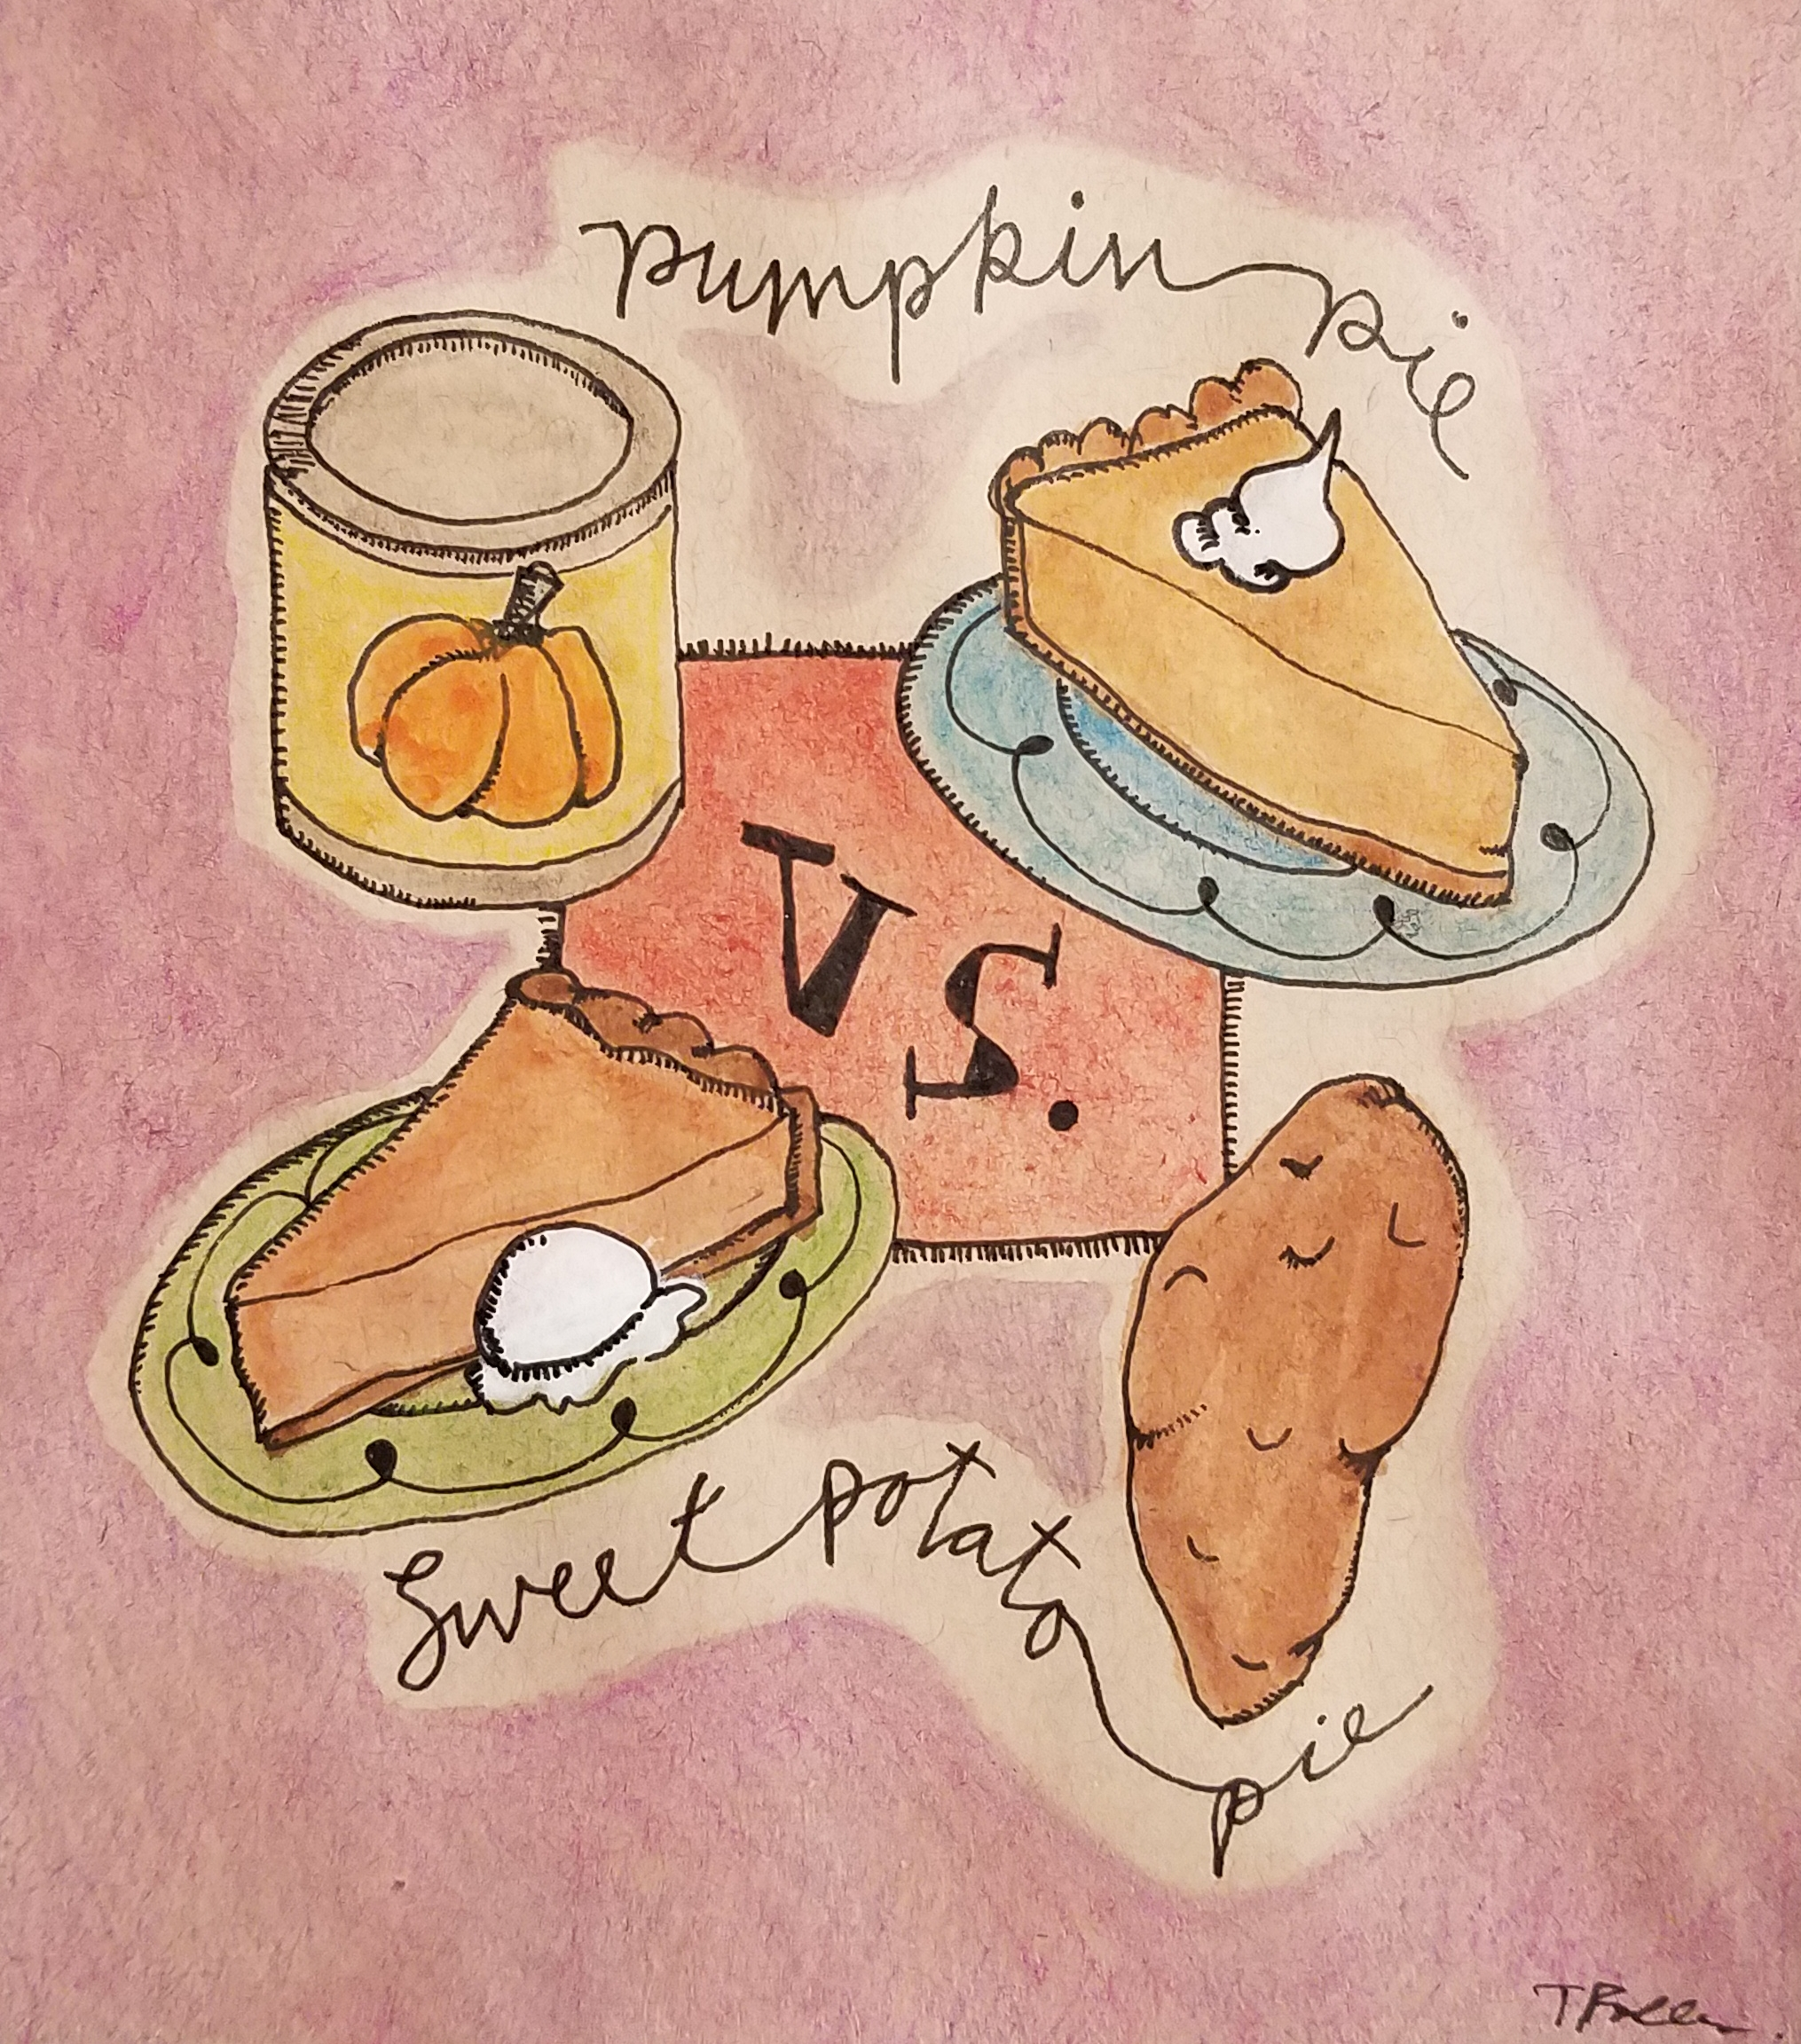 Pumpkin Pie vs. Sweet Potato Pie?